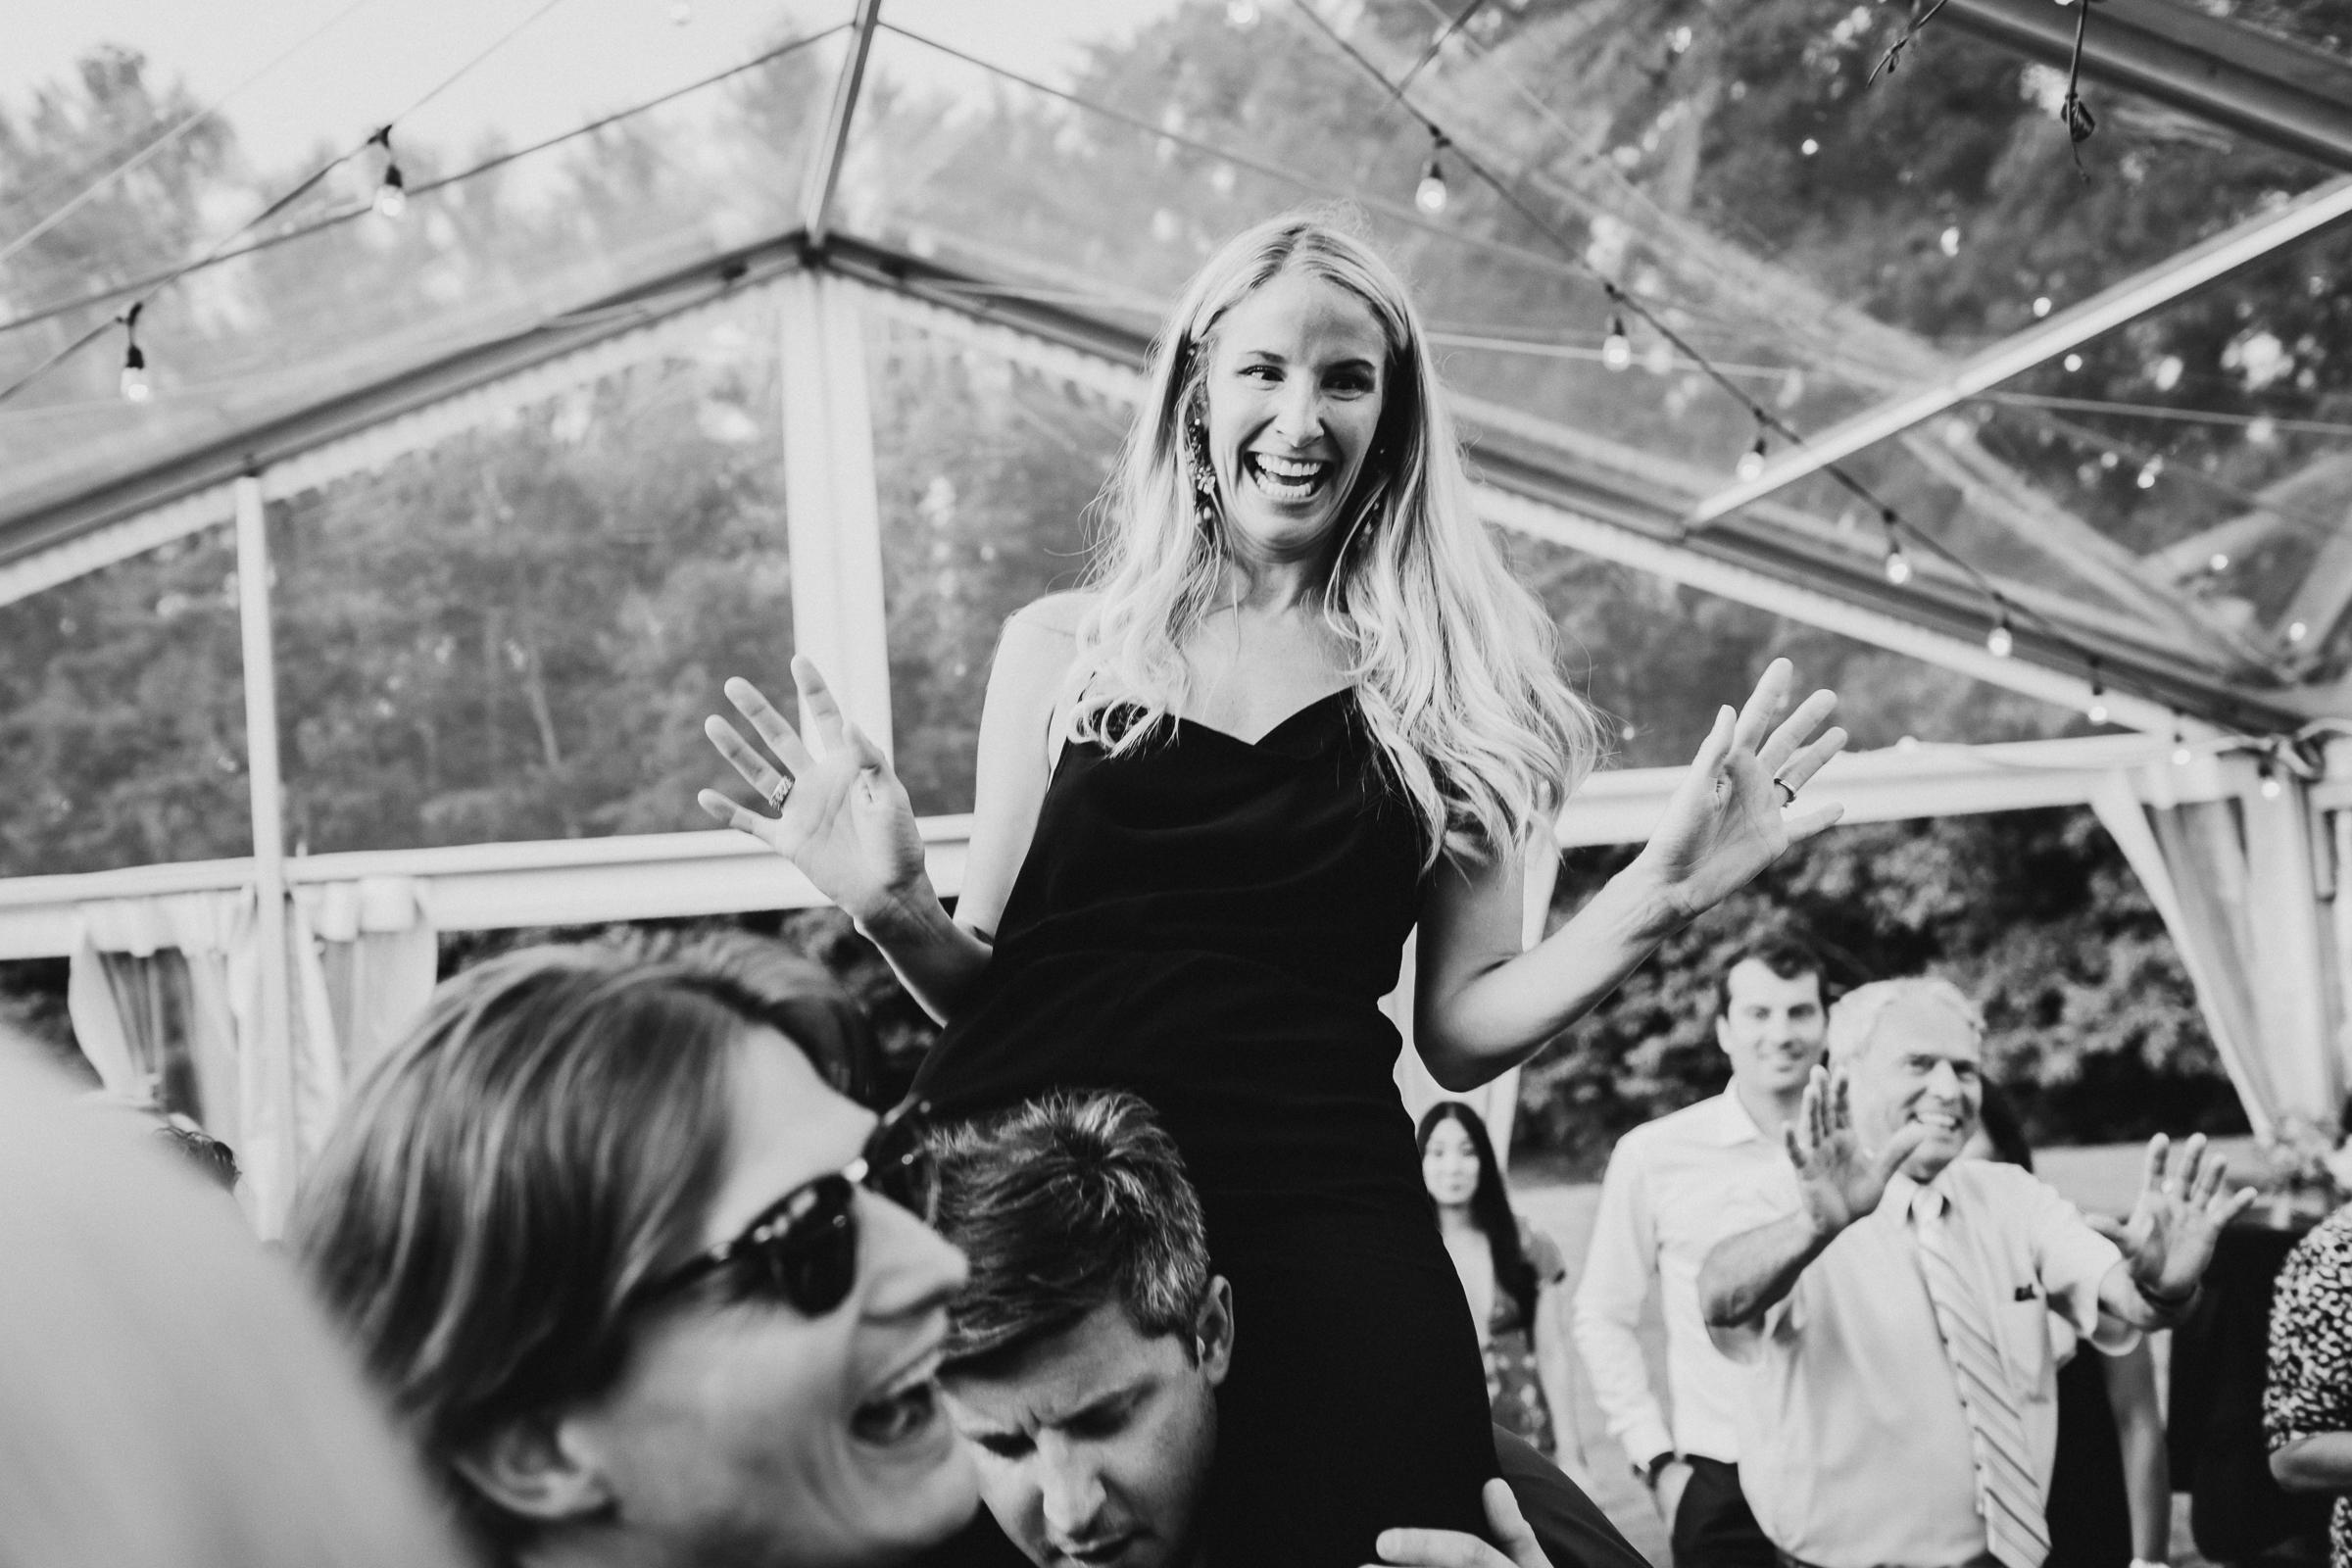 Marianmade-Farm-Wiscasset-Maine-Fine-Art-Documentary-Wedding-Photographer-Elvira-Kalviste-Photography-140.jpg